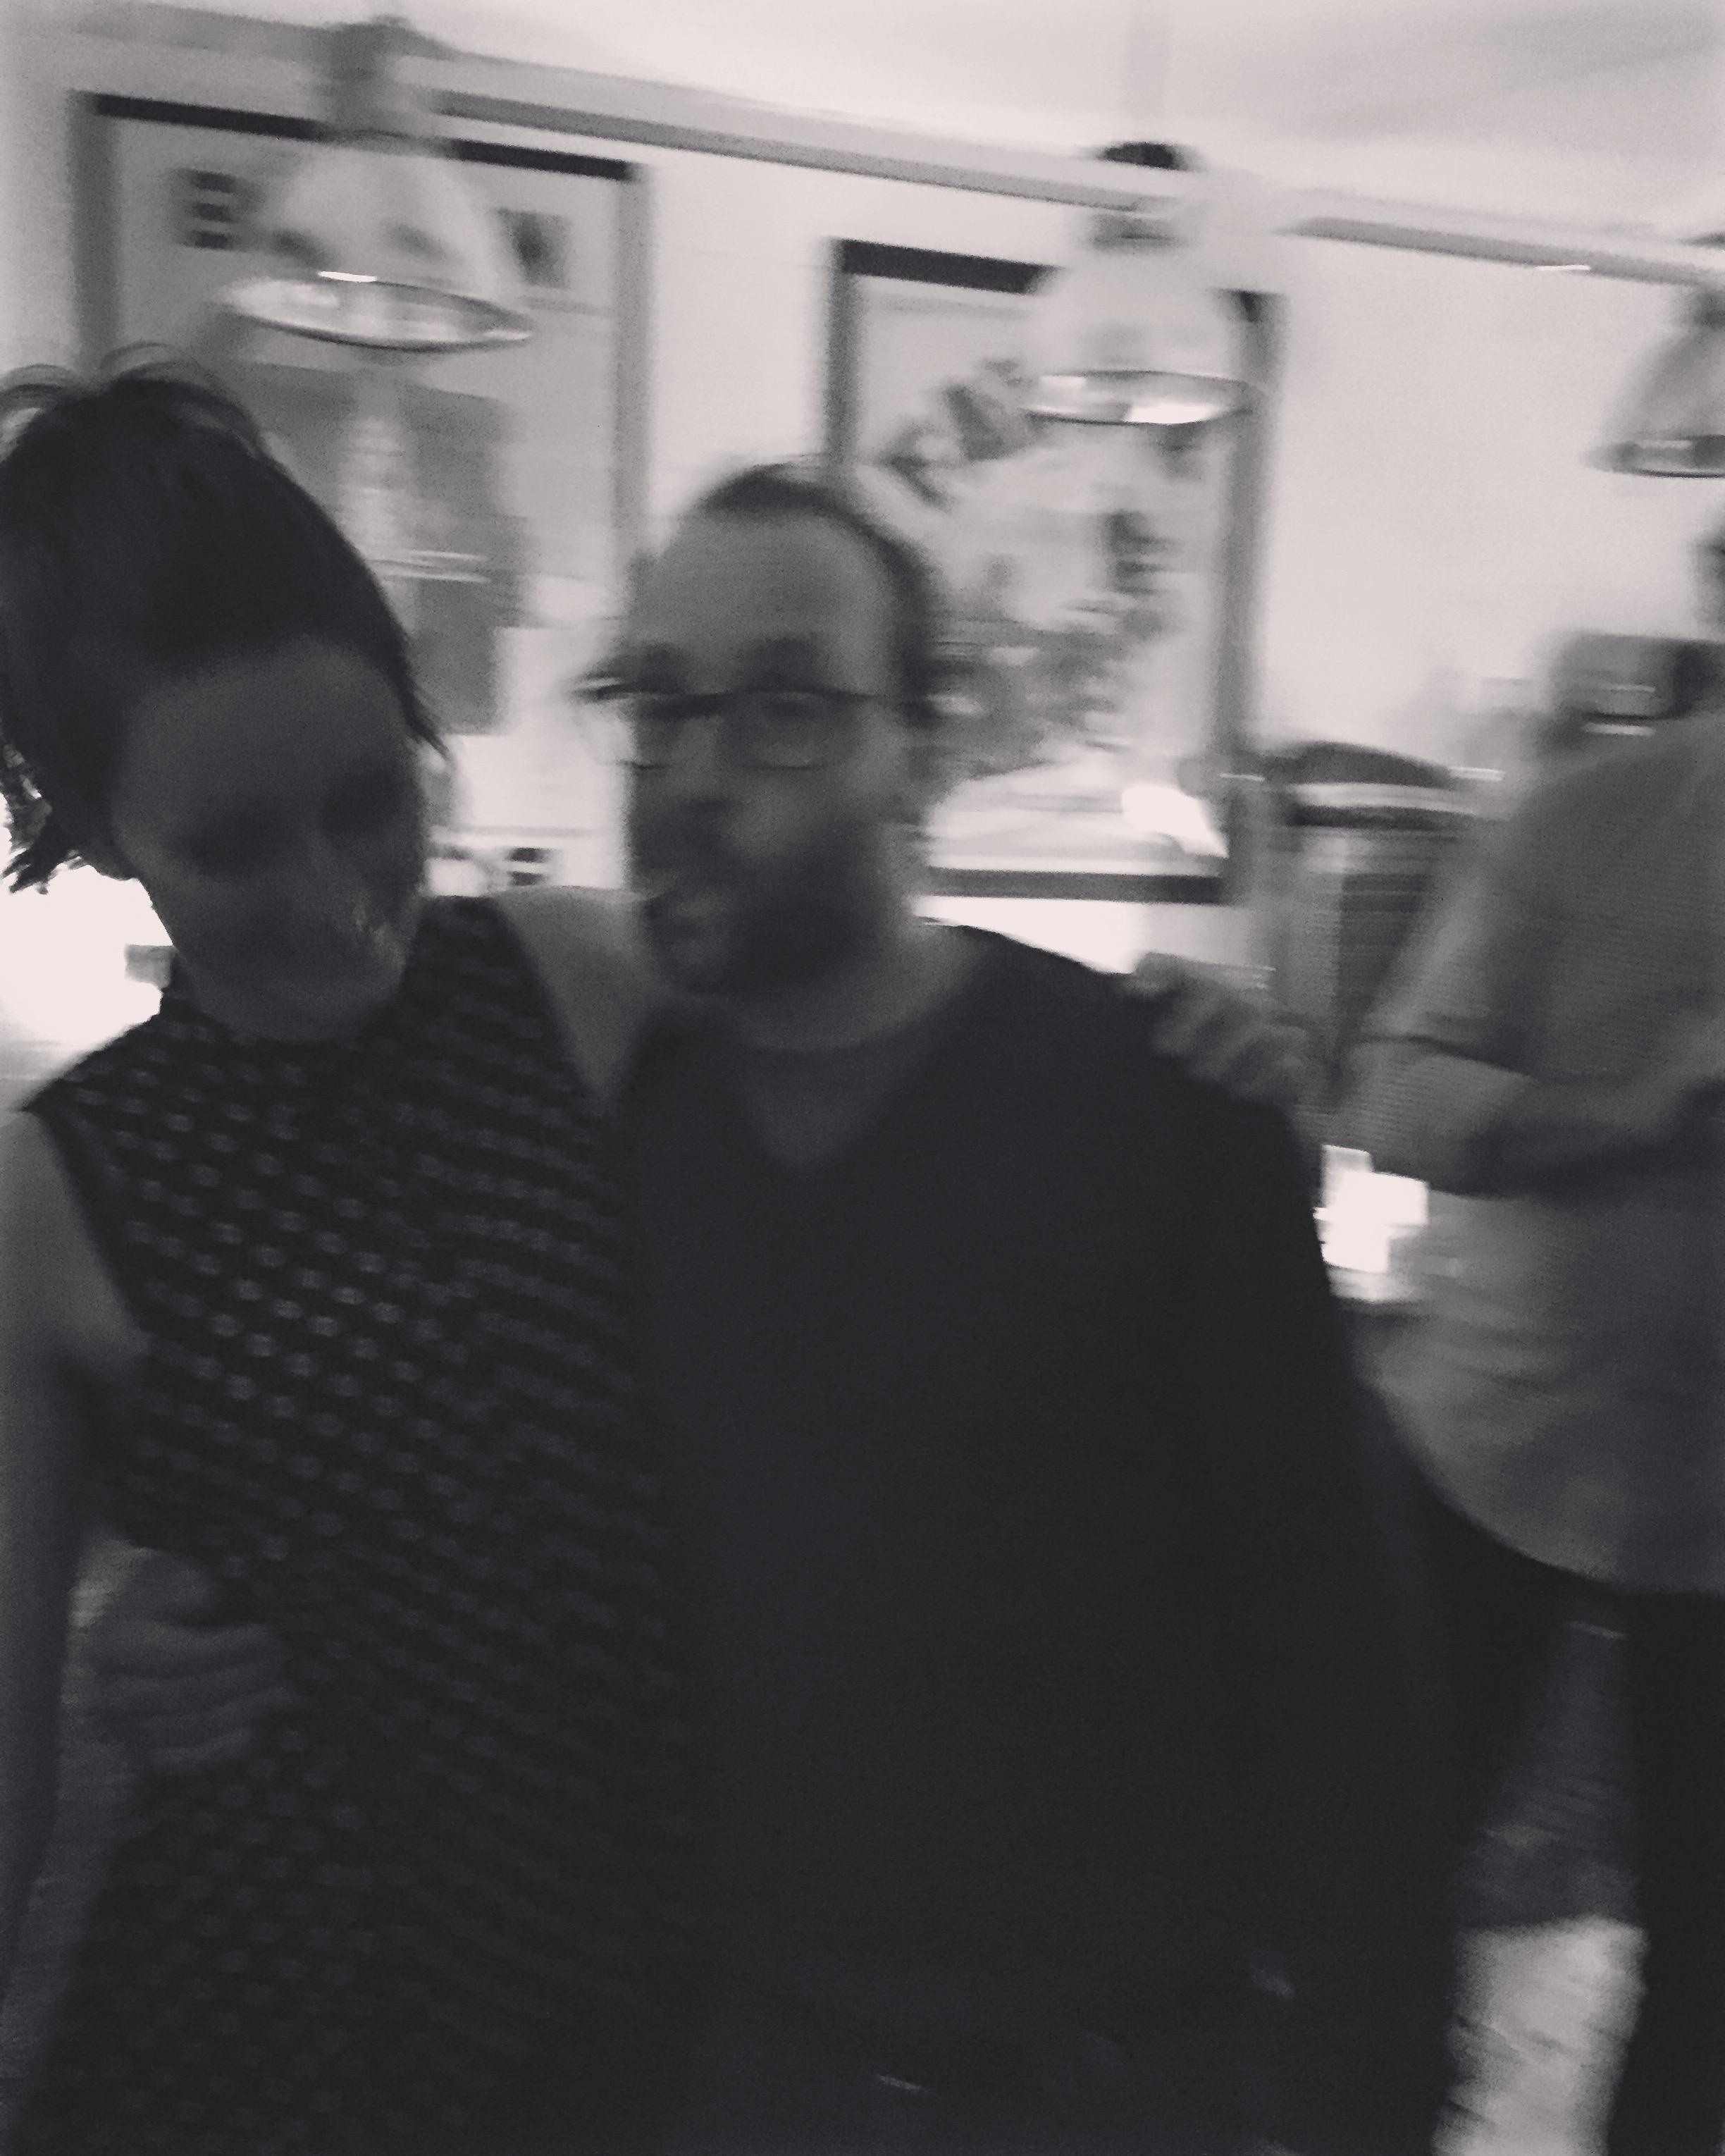 Emily Harman and winemaker Tom Shobbrook. Mon 16 May 2016.